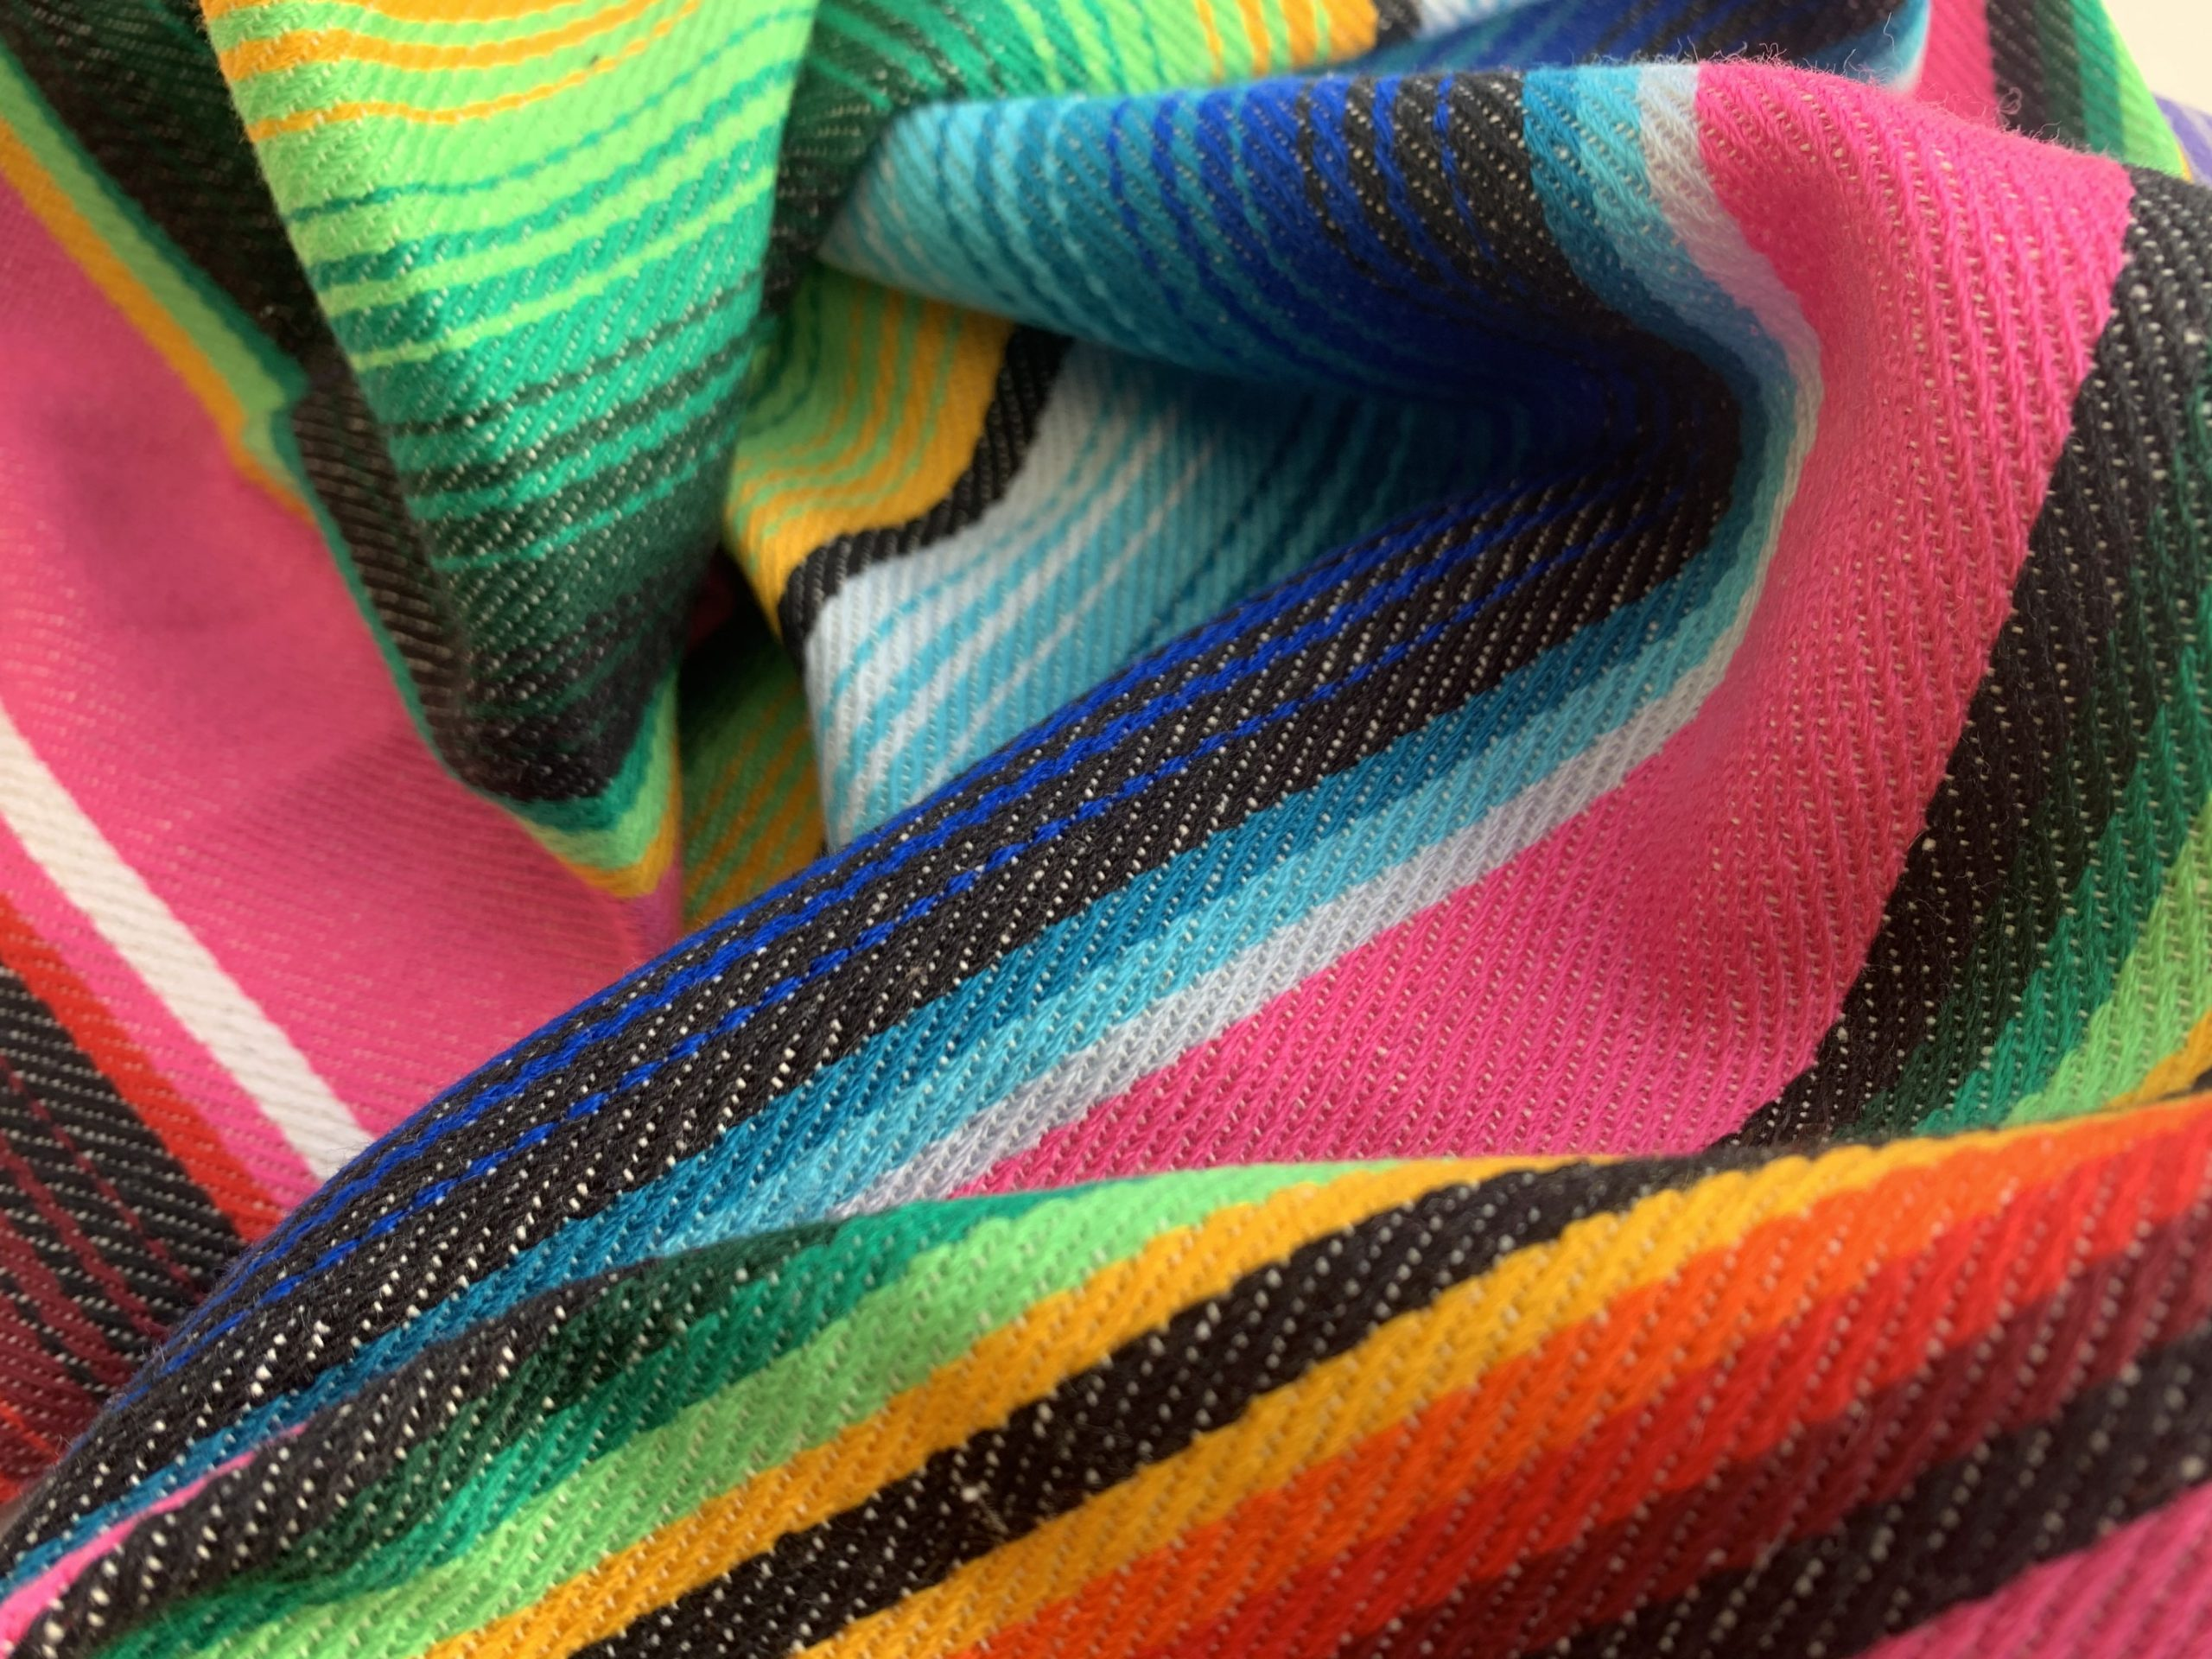 Serape fabric used to make a graduation stole